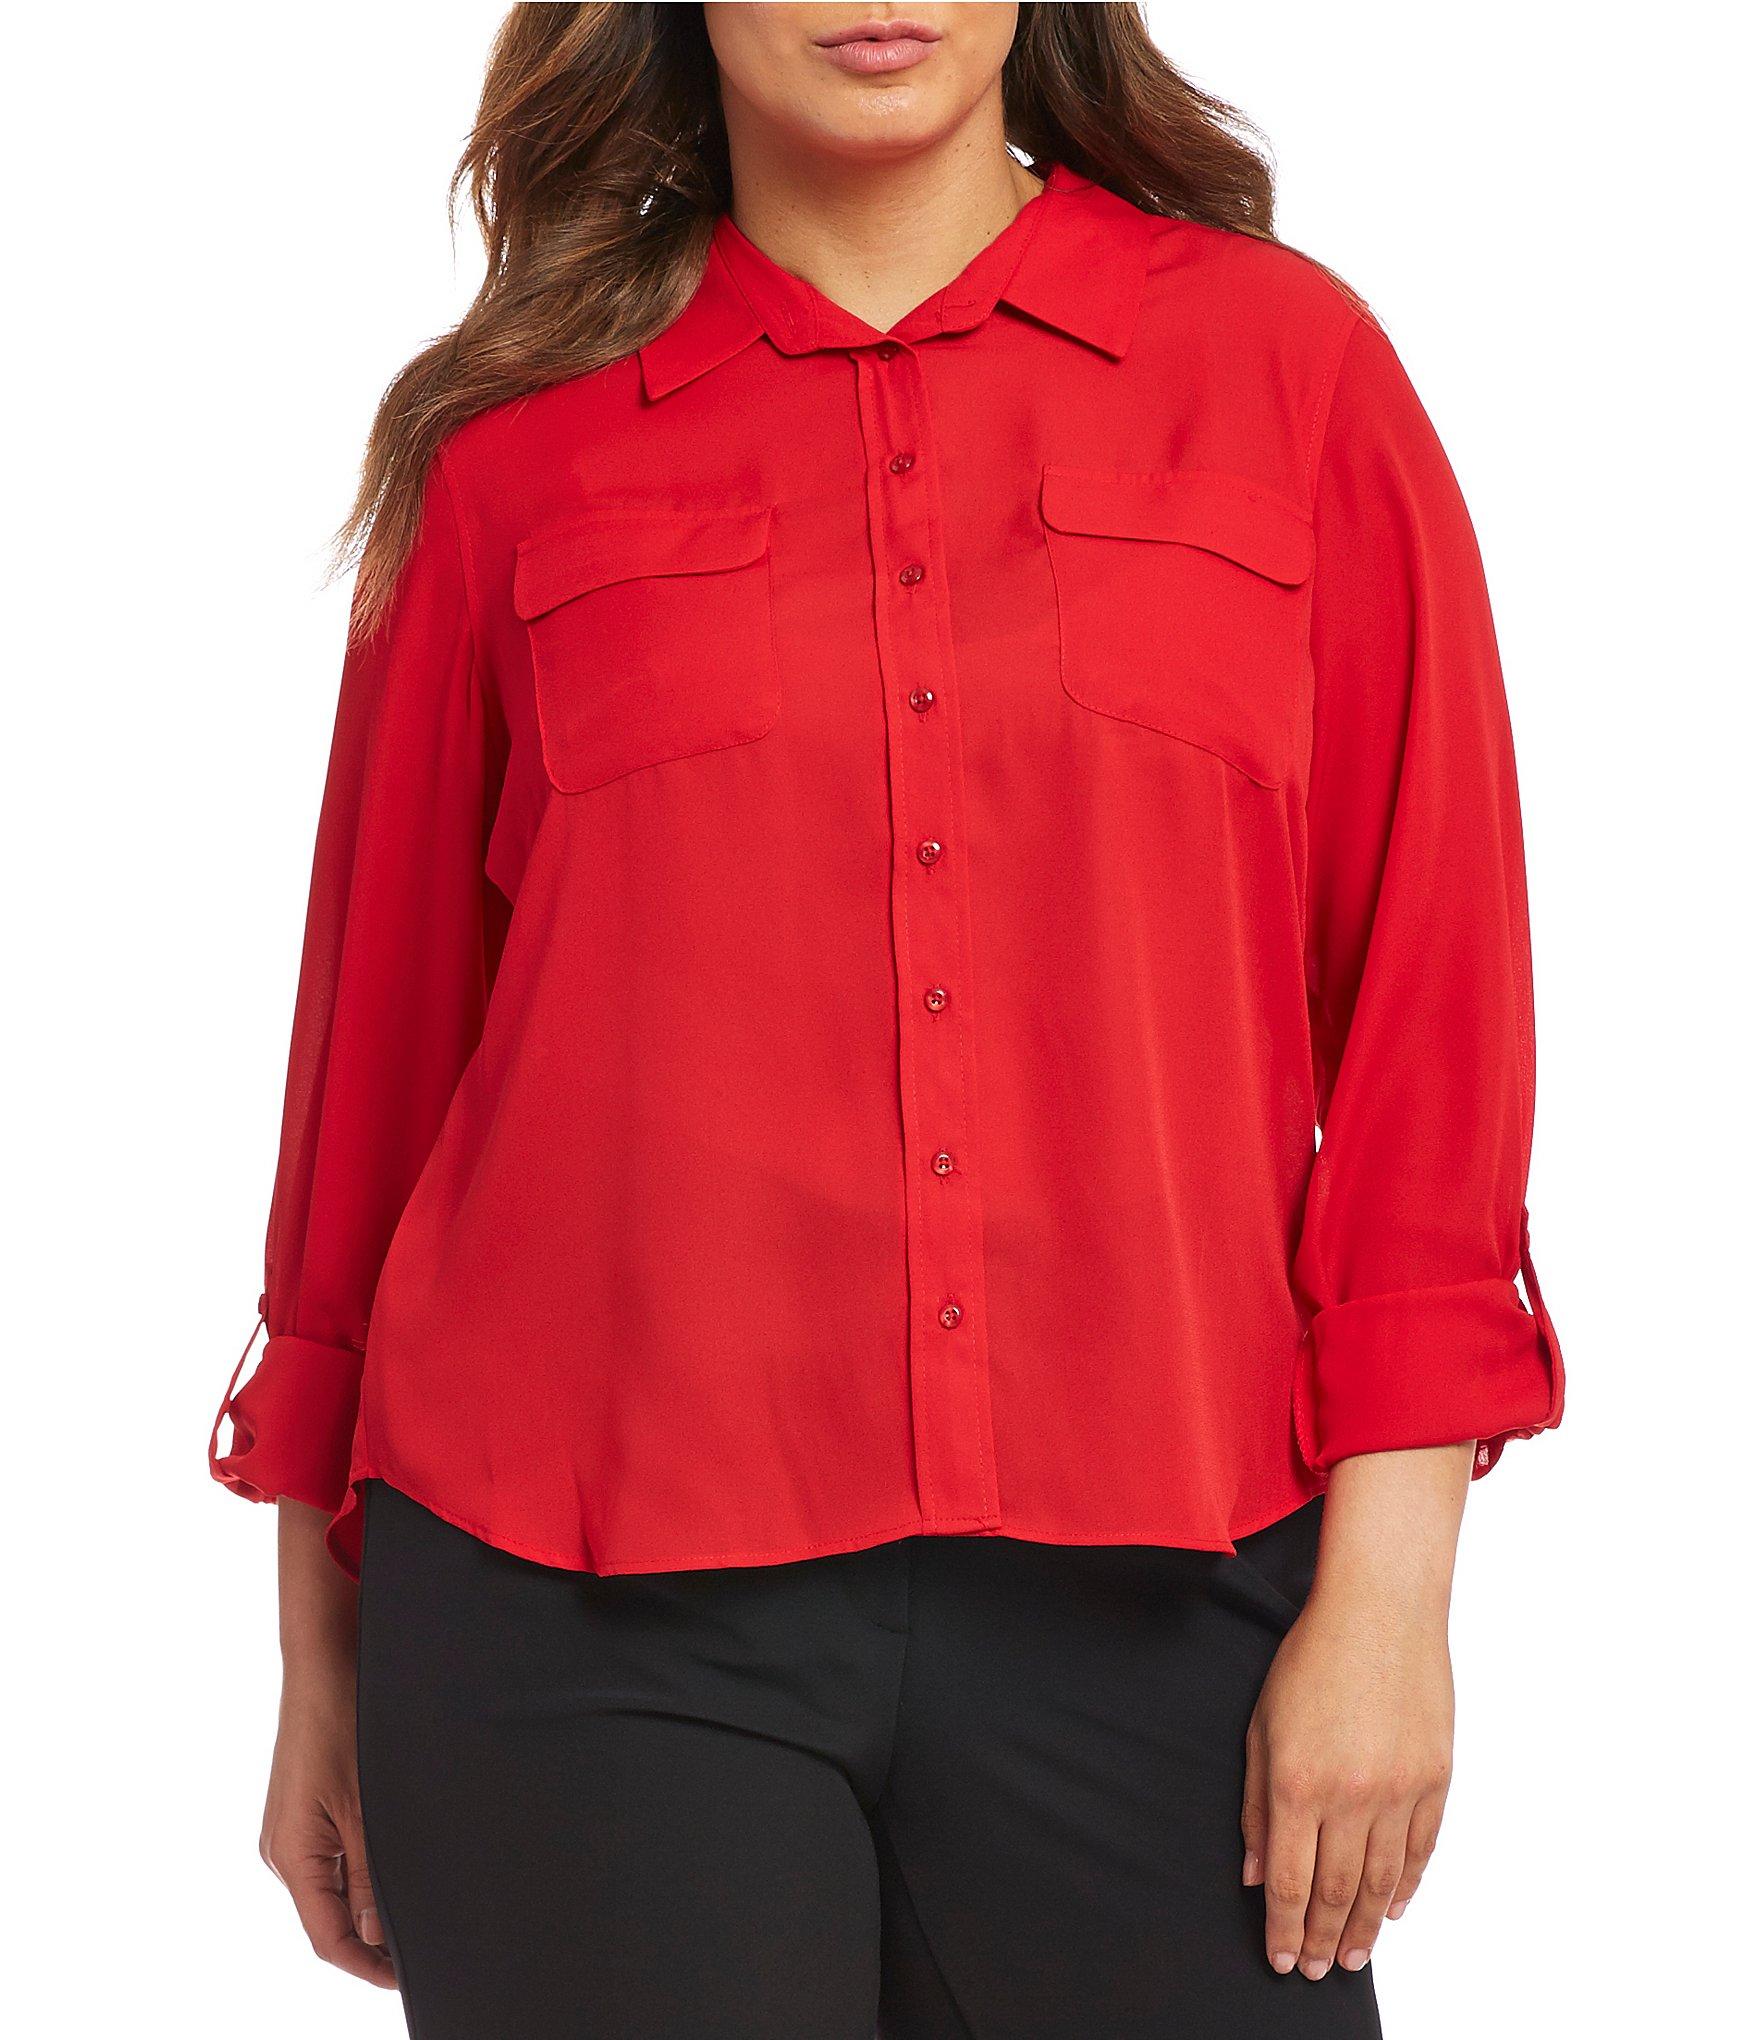 red blouse plus-size tops u0026 blouses | dillards ksrydyy